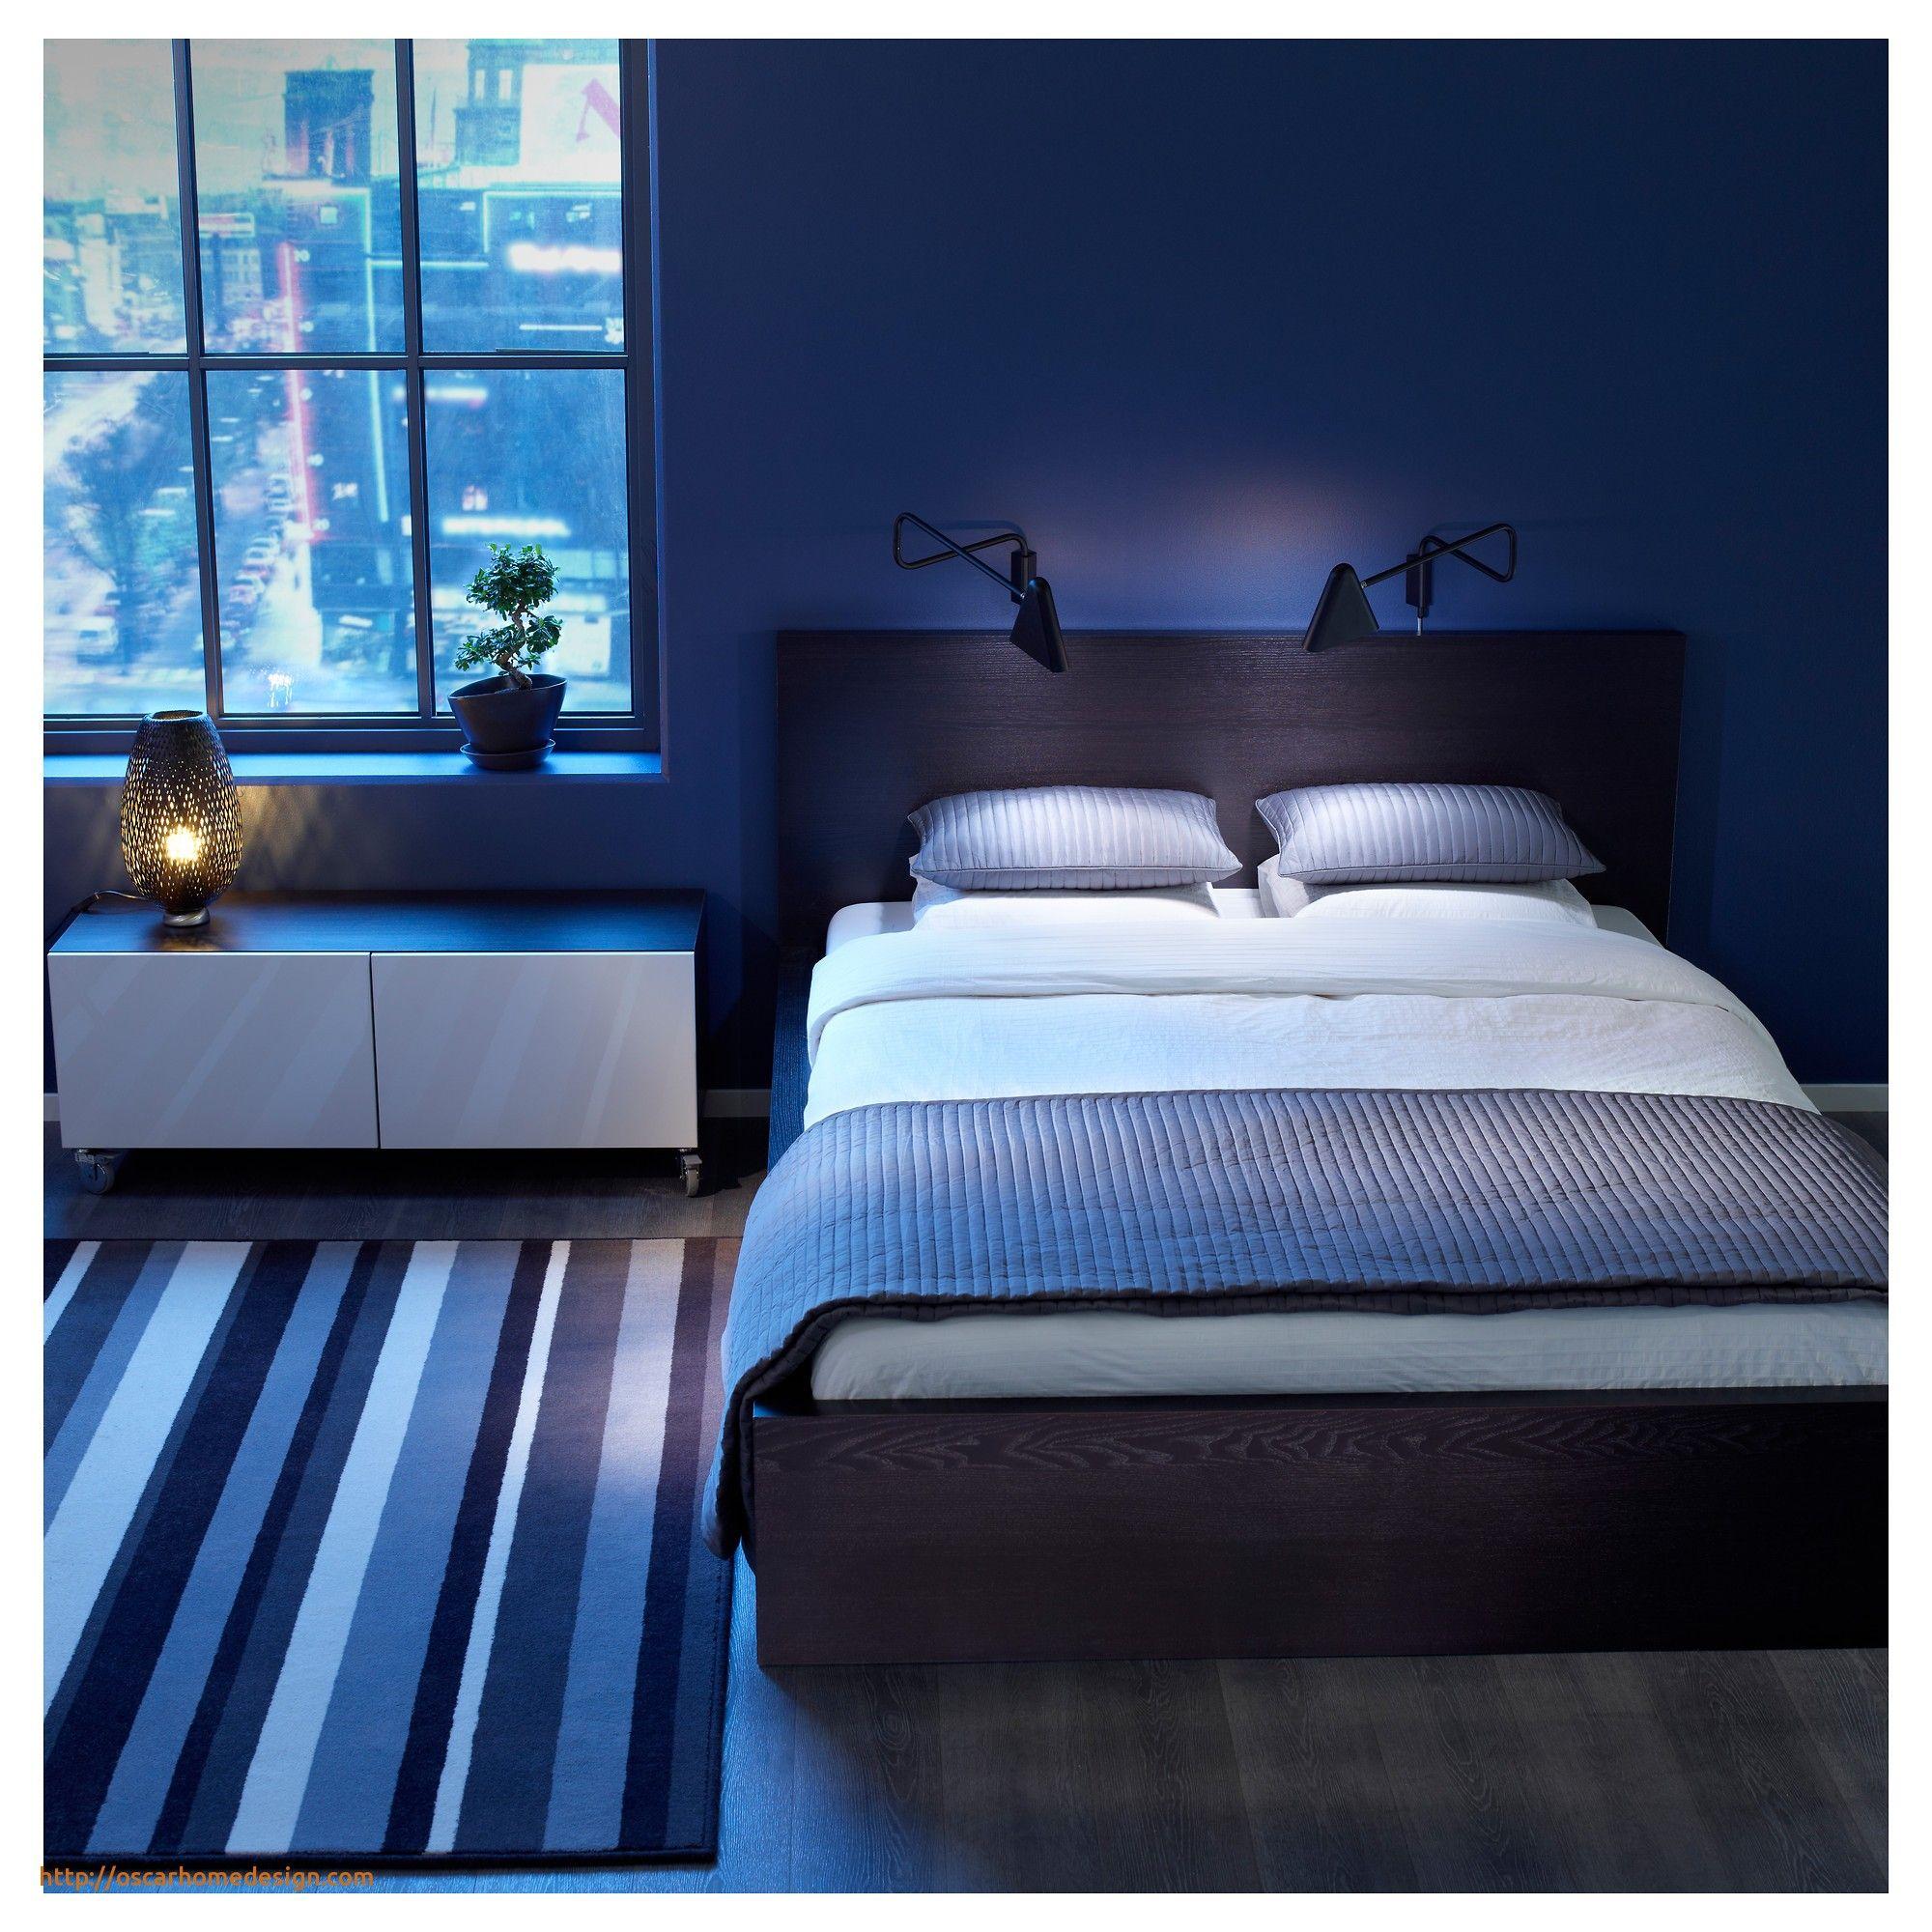 картинки спален в синих тонах красавица трижды течение